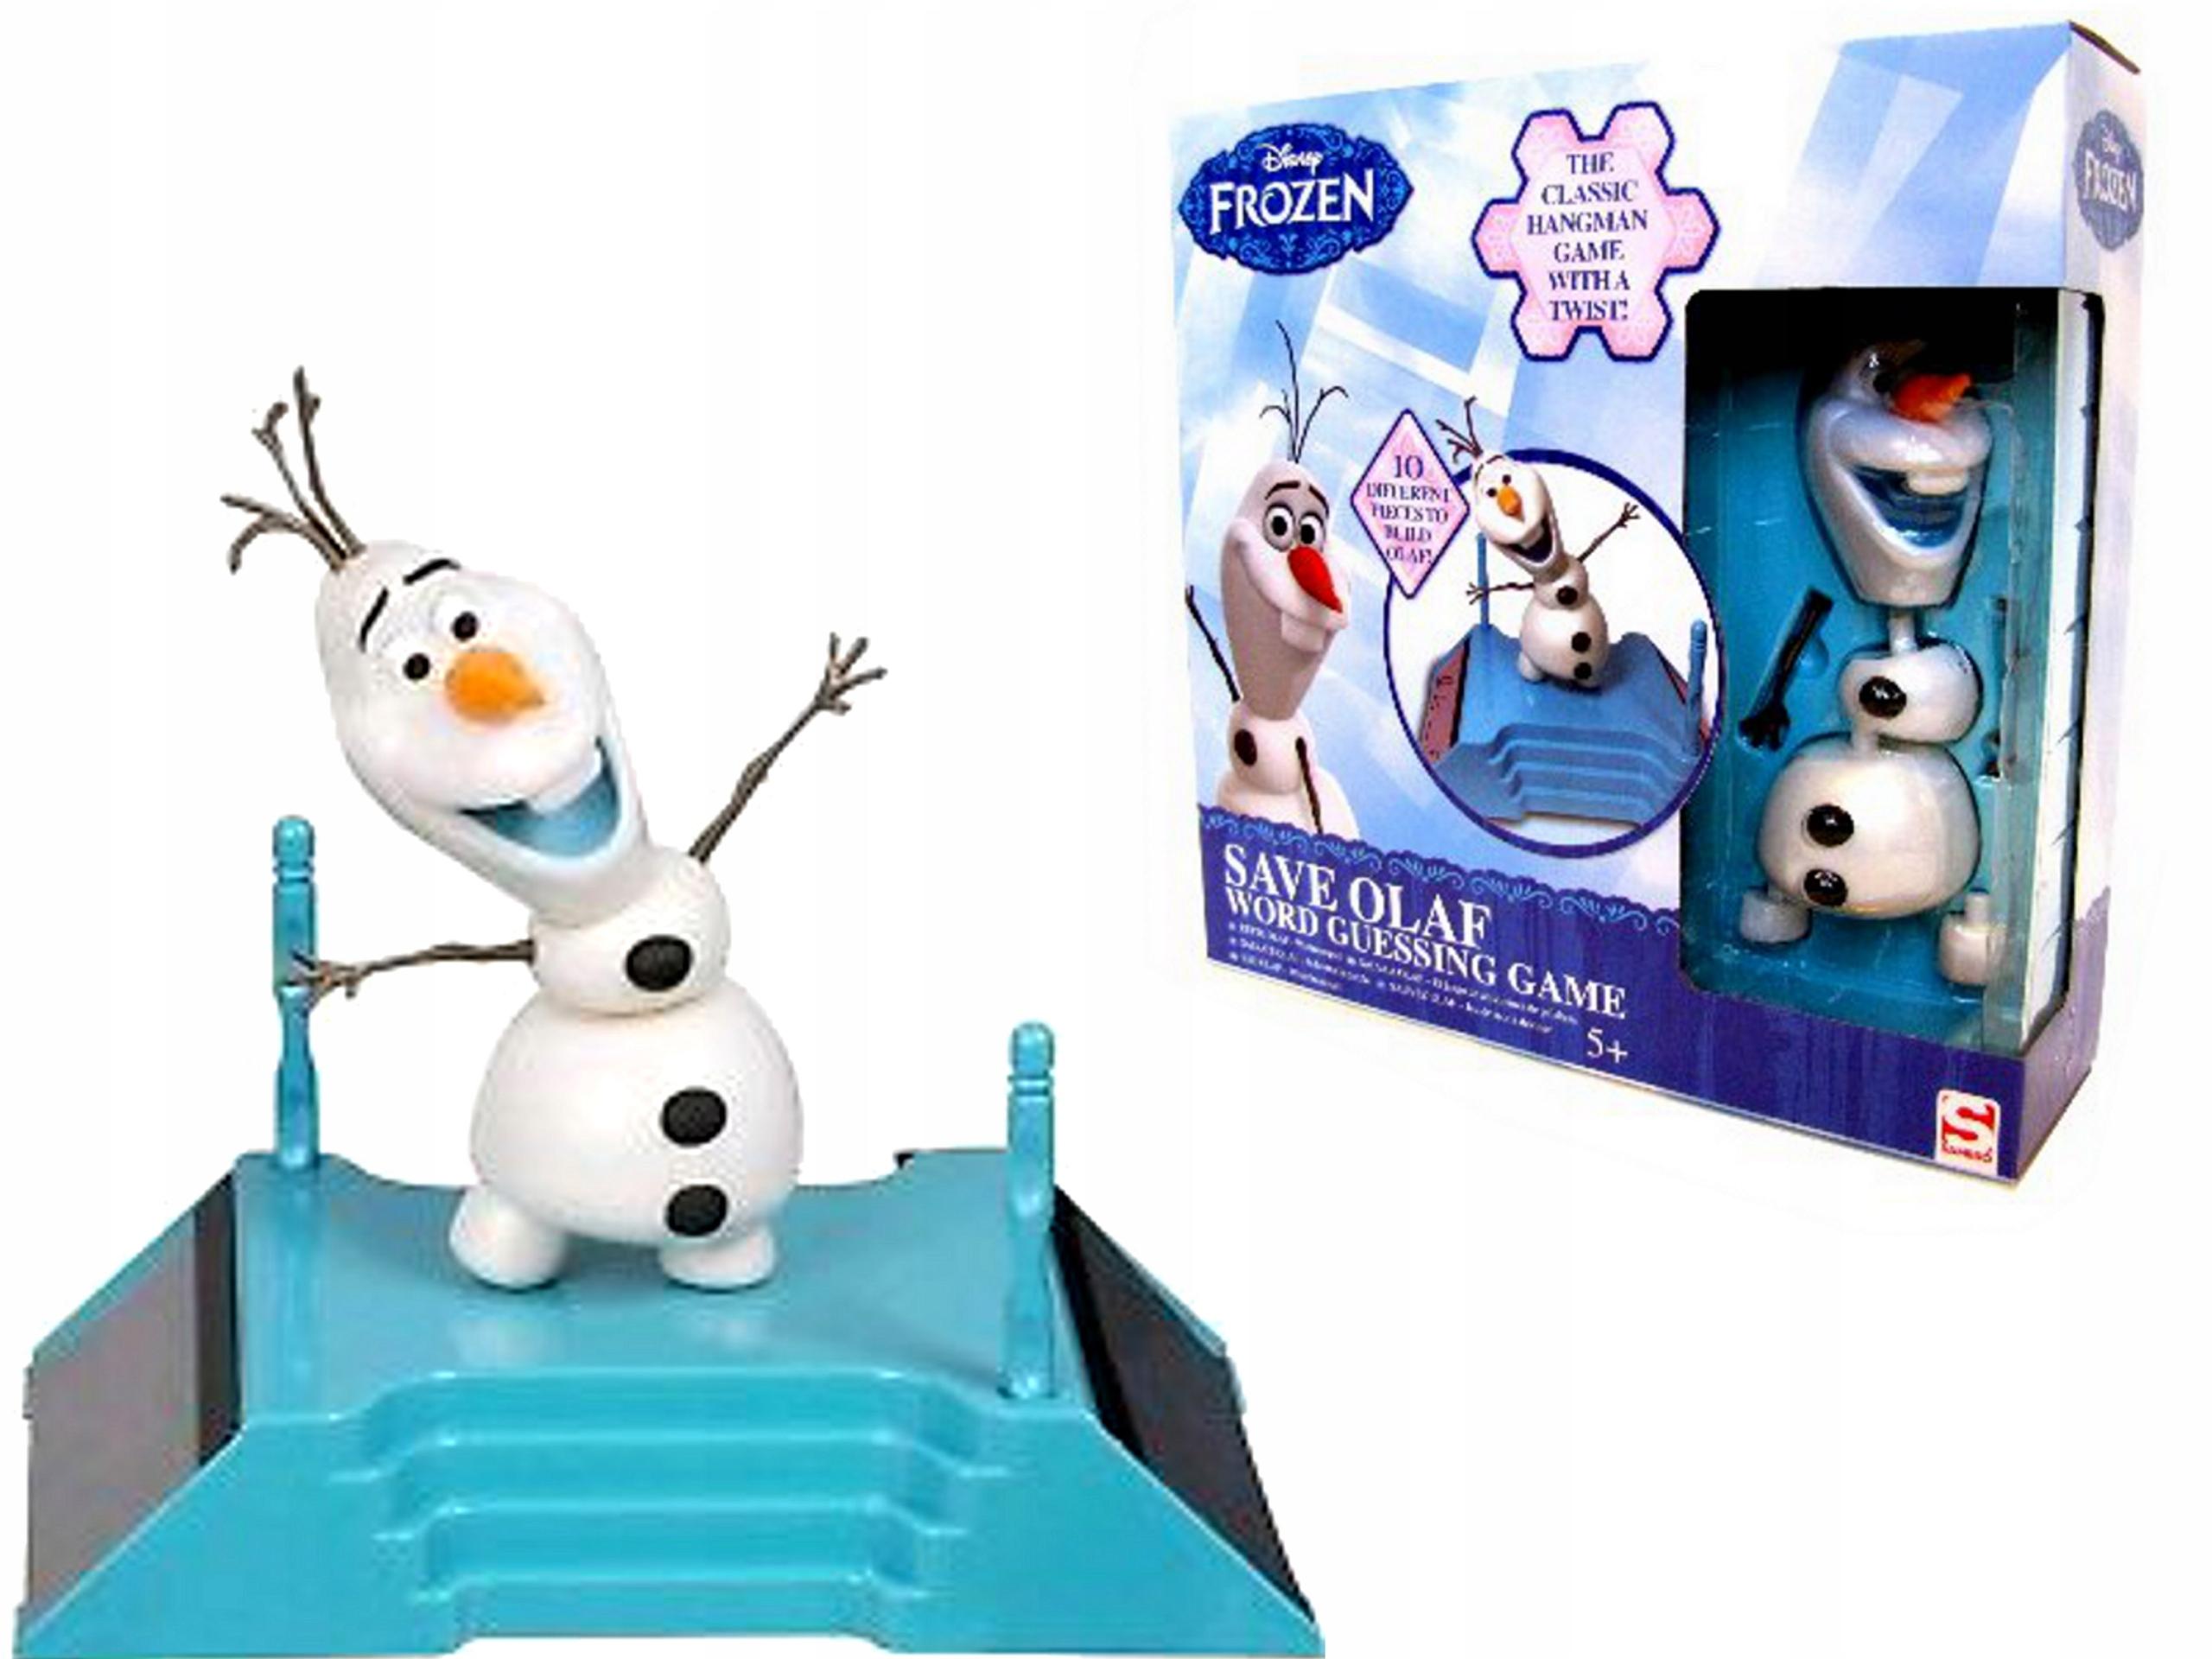 ULOŽTE tému OLAF GAME FROZEN OLAF B